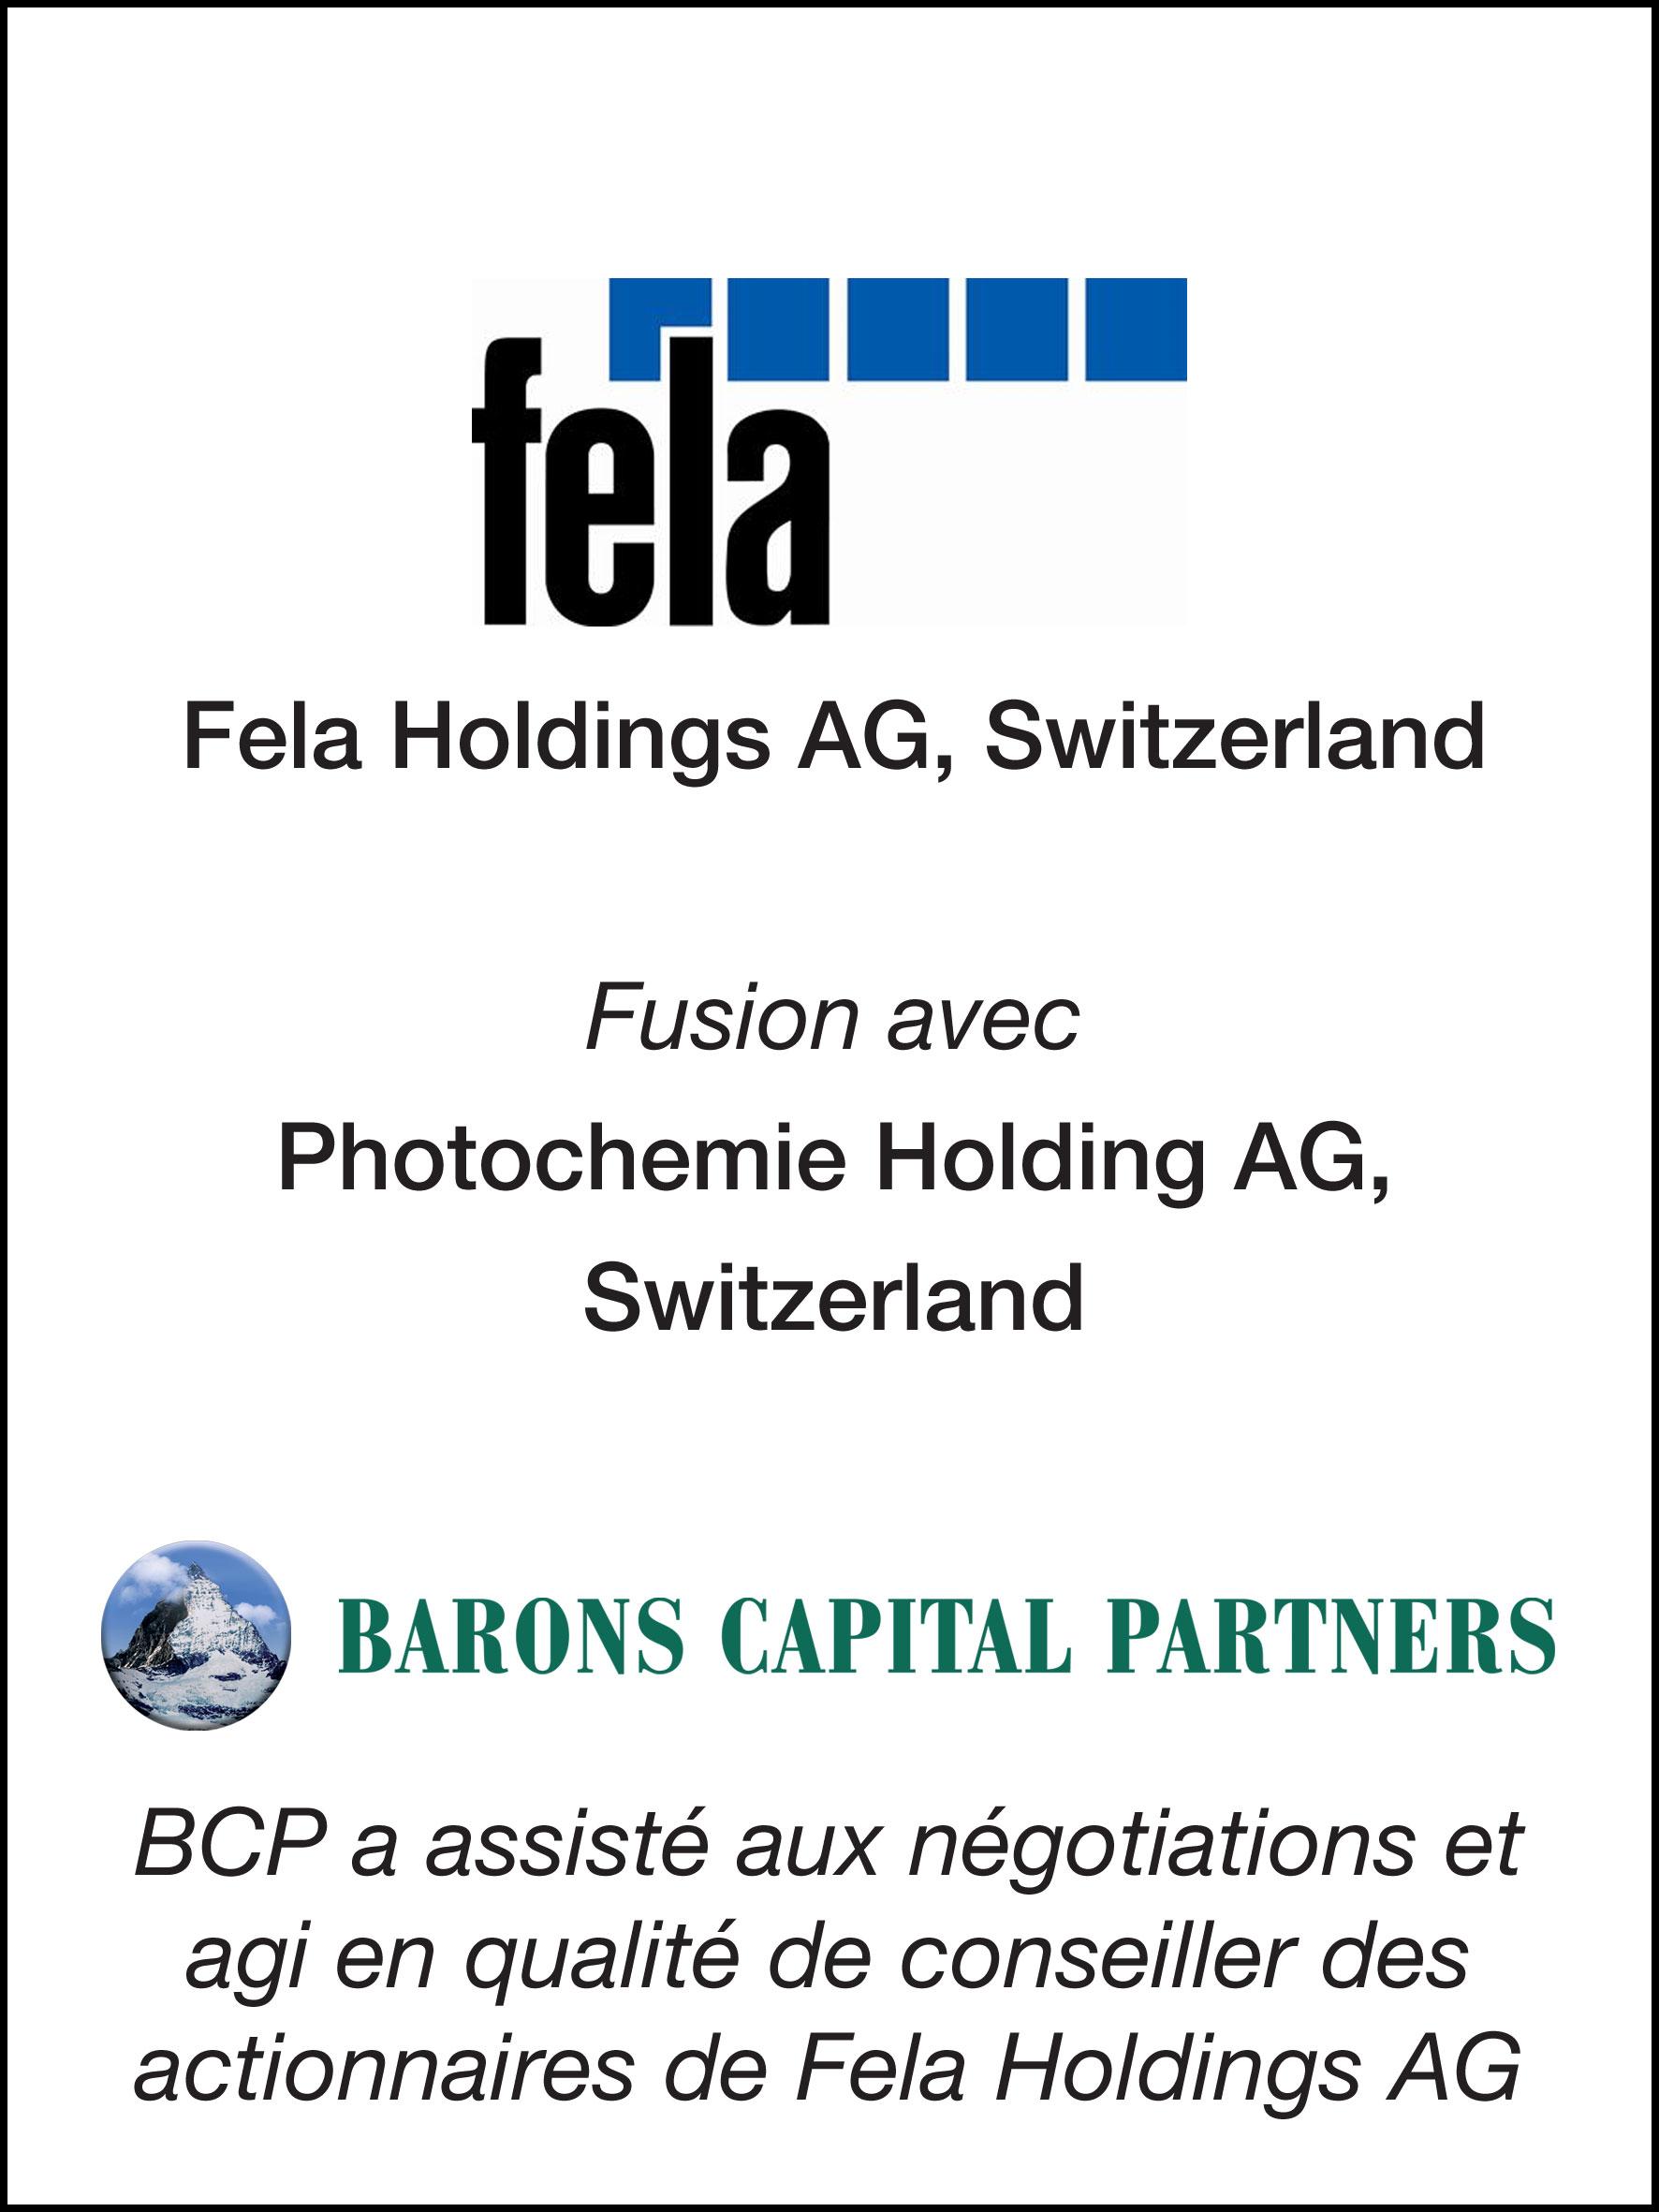 19_Fela Holdings AG_F